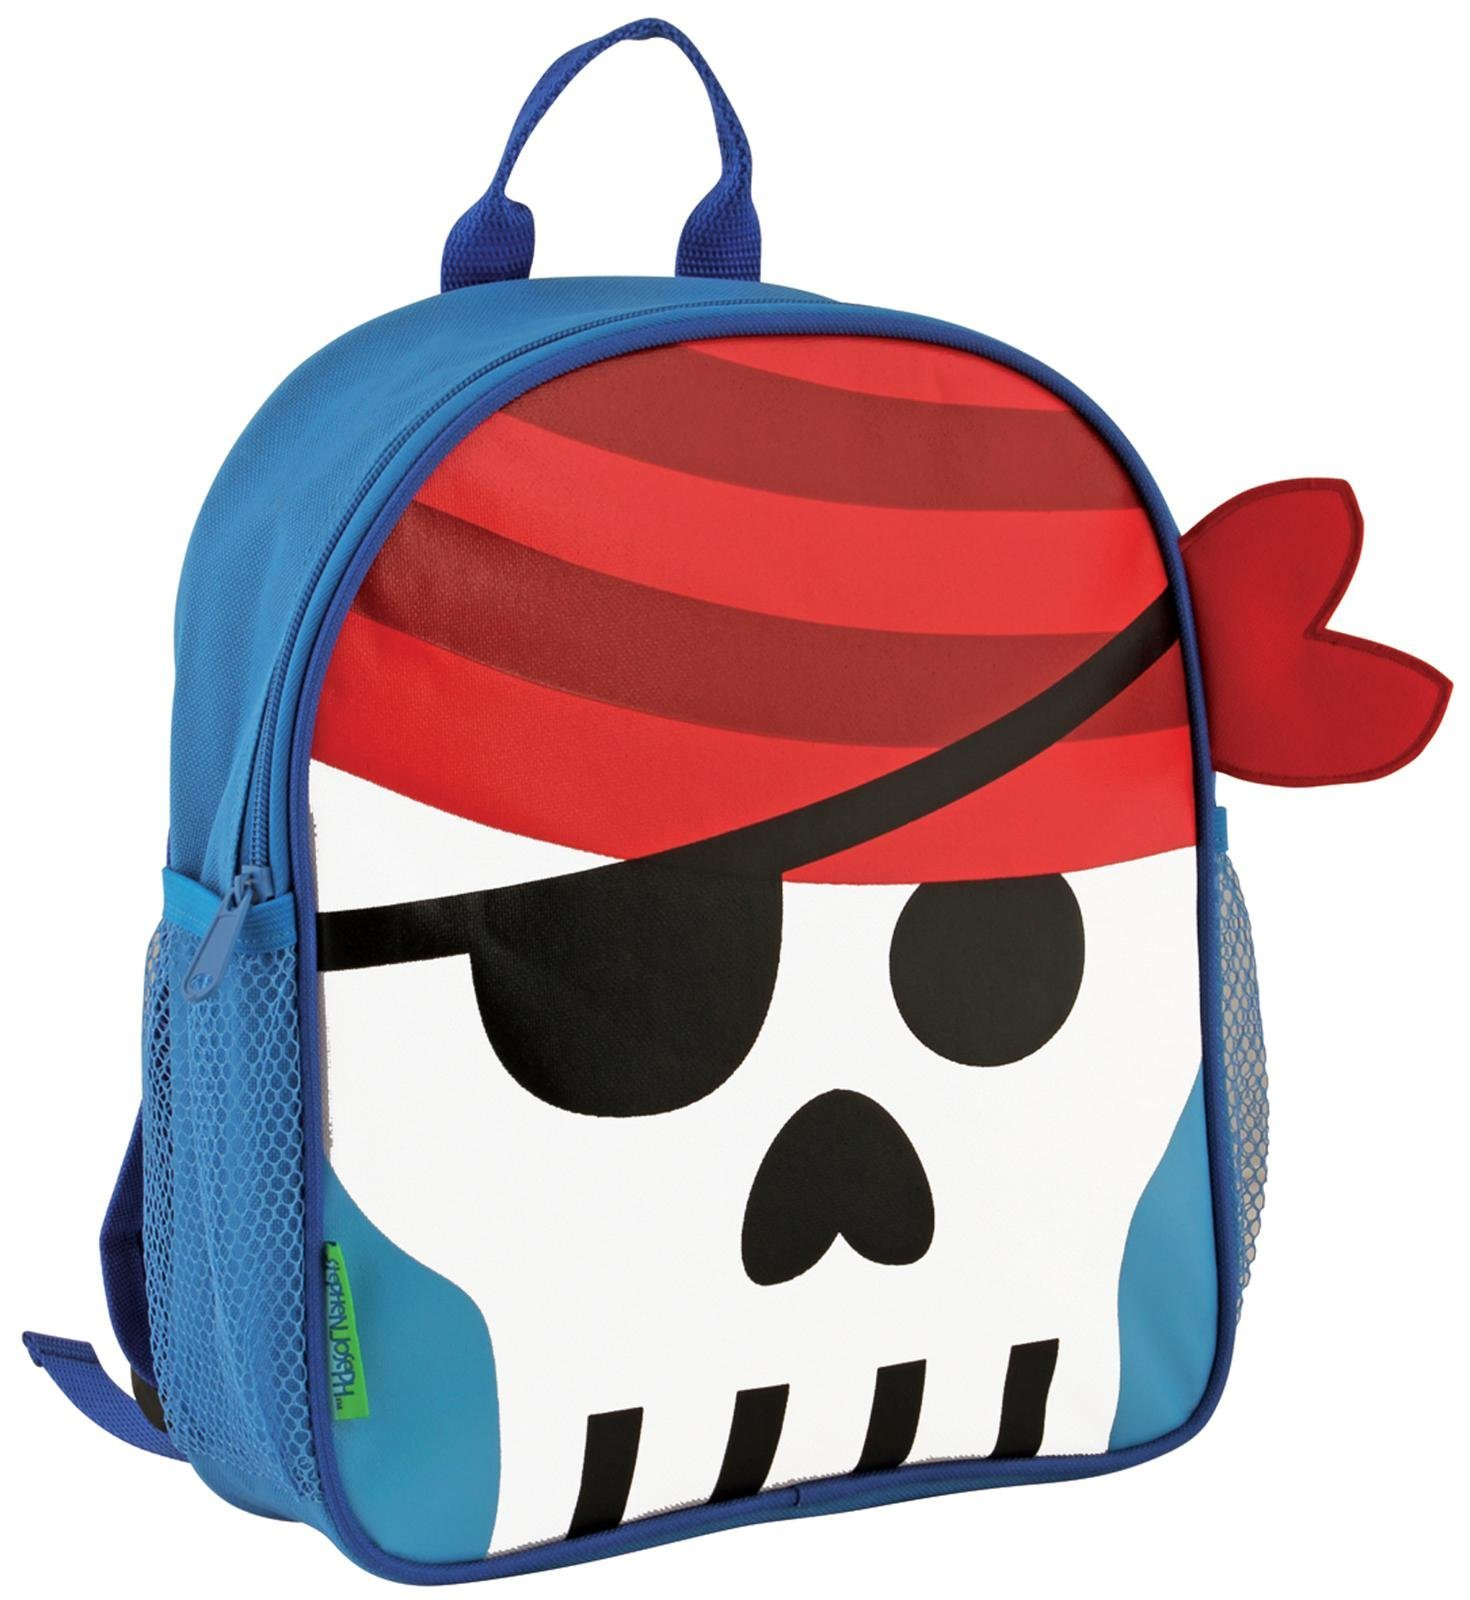 Stephen Joseph Mini Sidekick Pirate Backpack